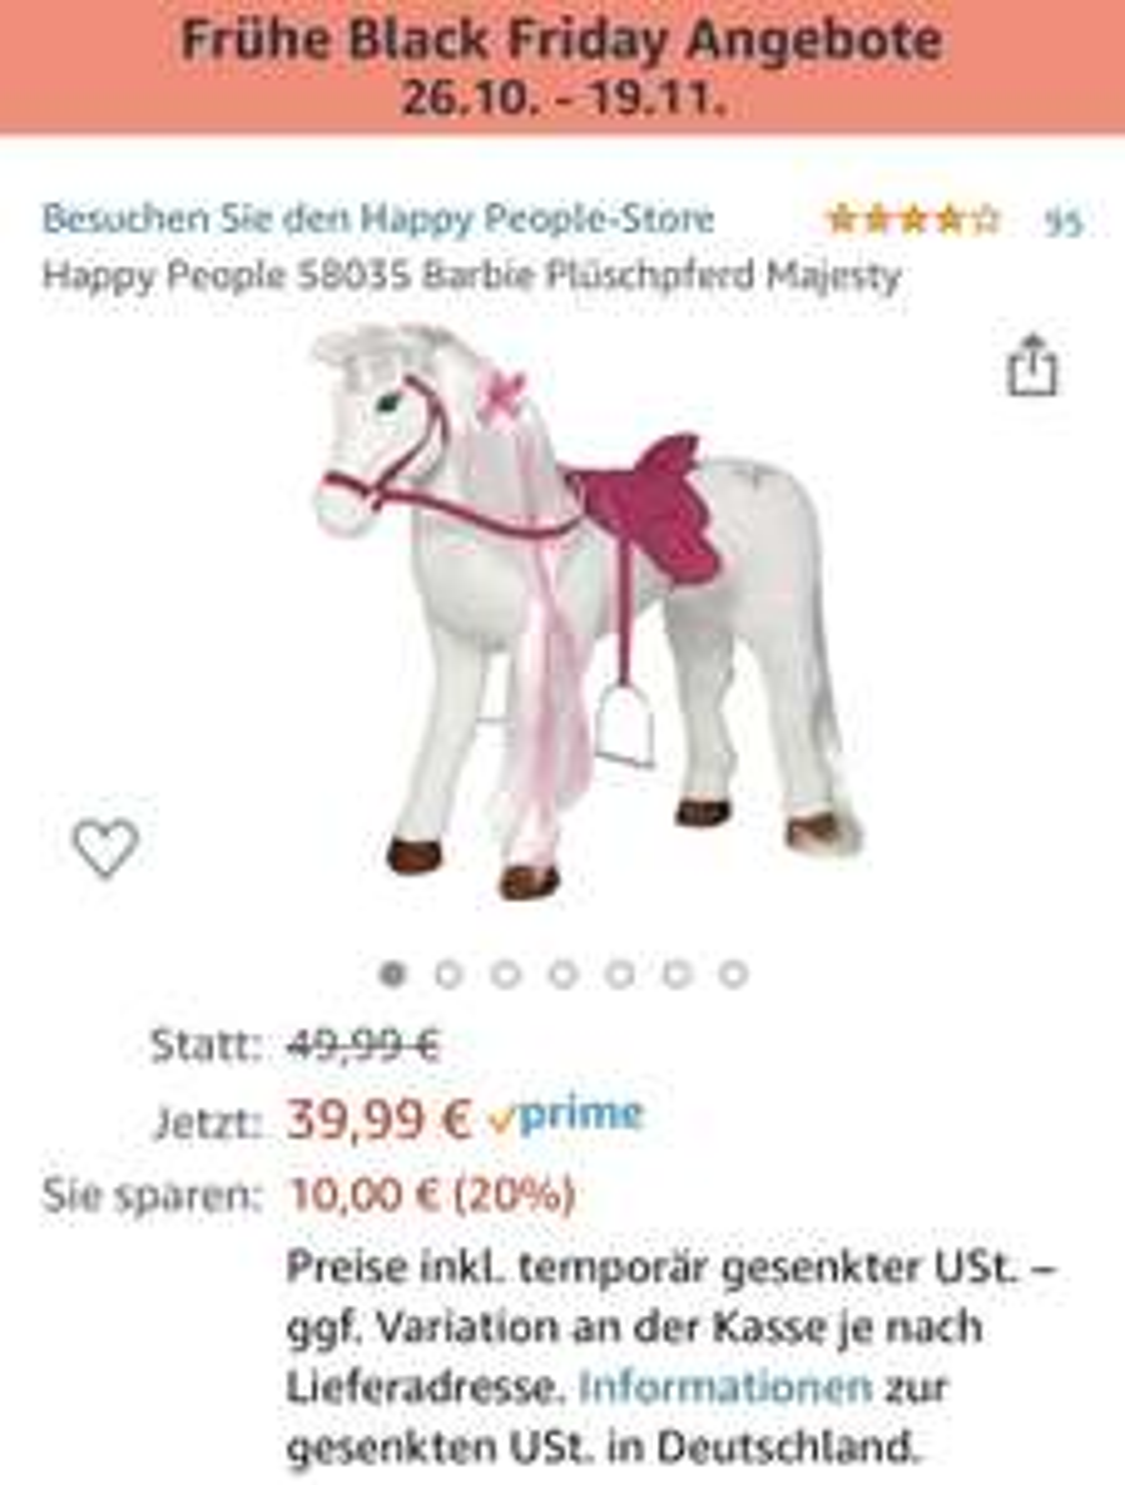 Happy People 58035 Barbie Plüschpferd Majesty